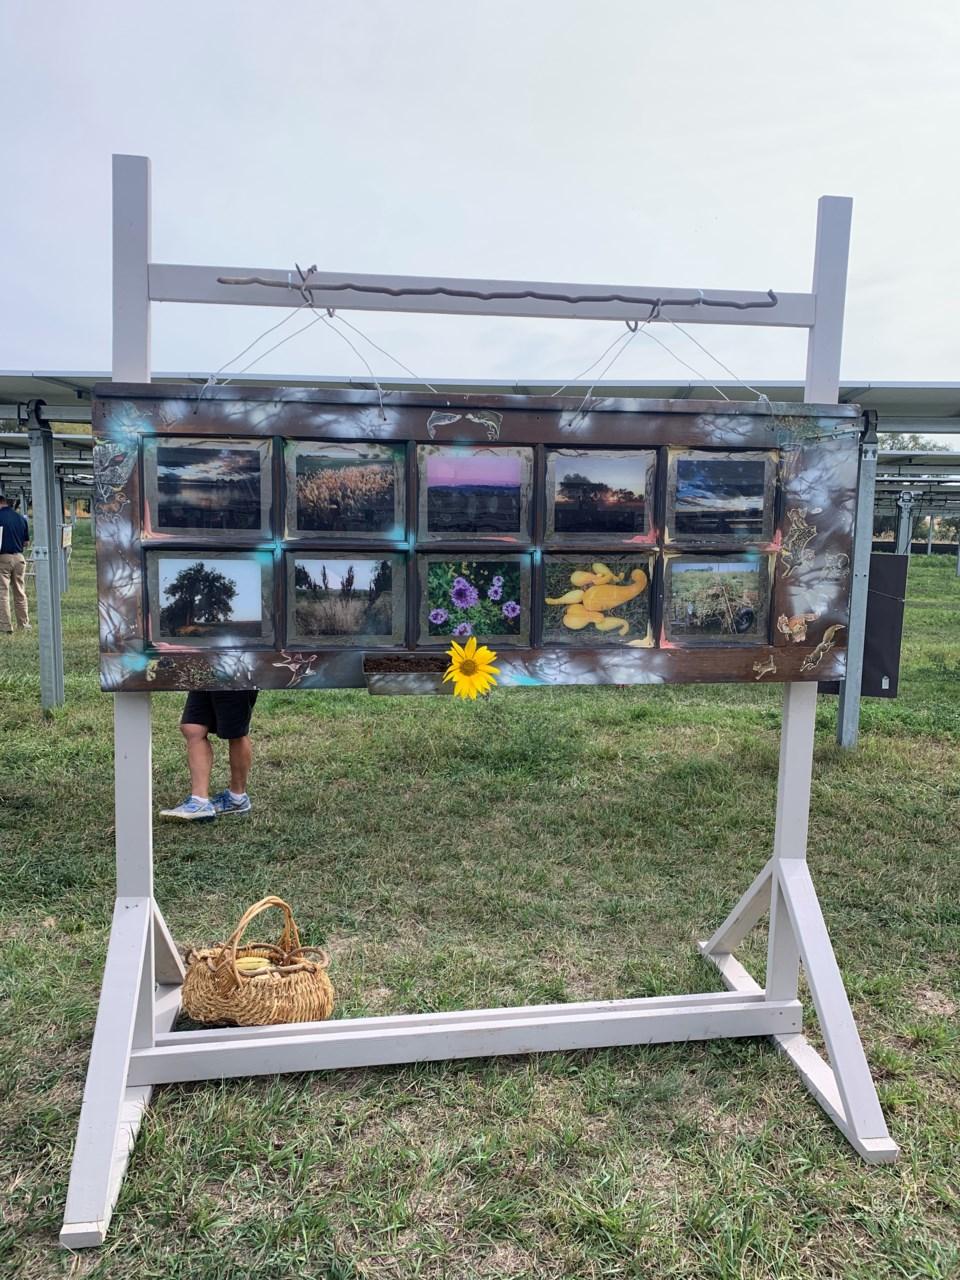 2021_02_20_LL_jacks_solar_garden_artist_residency2